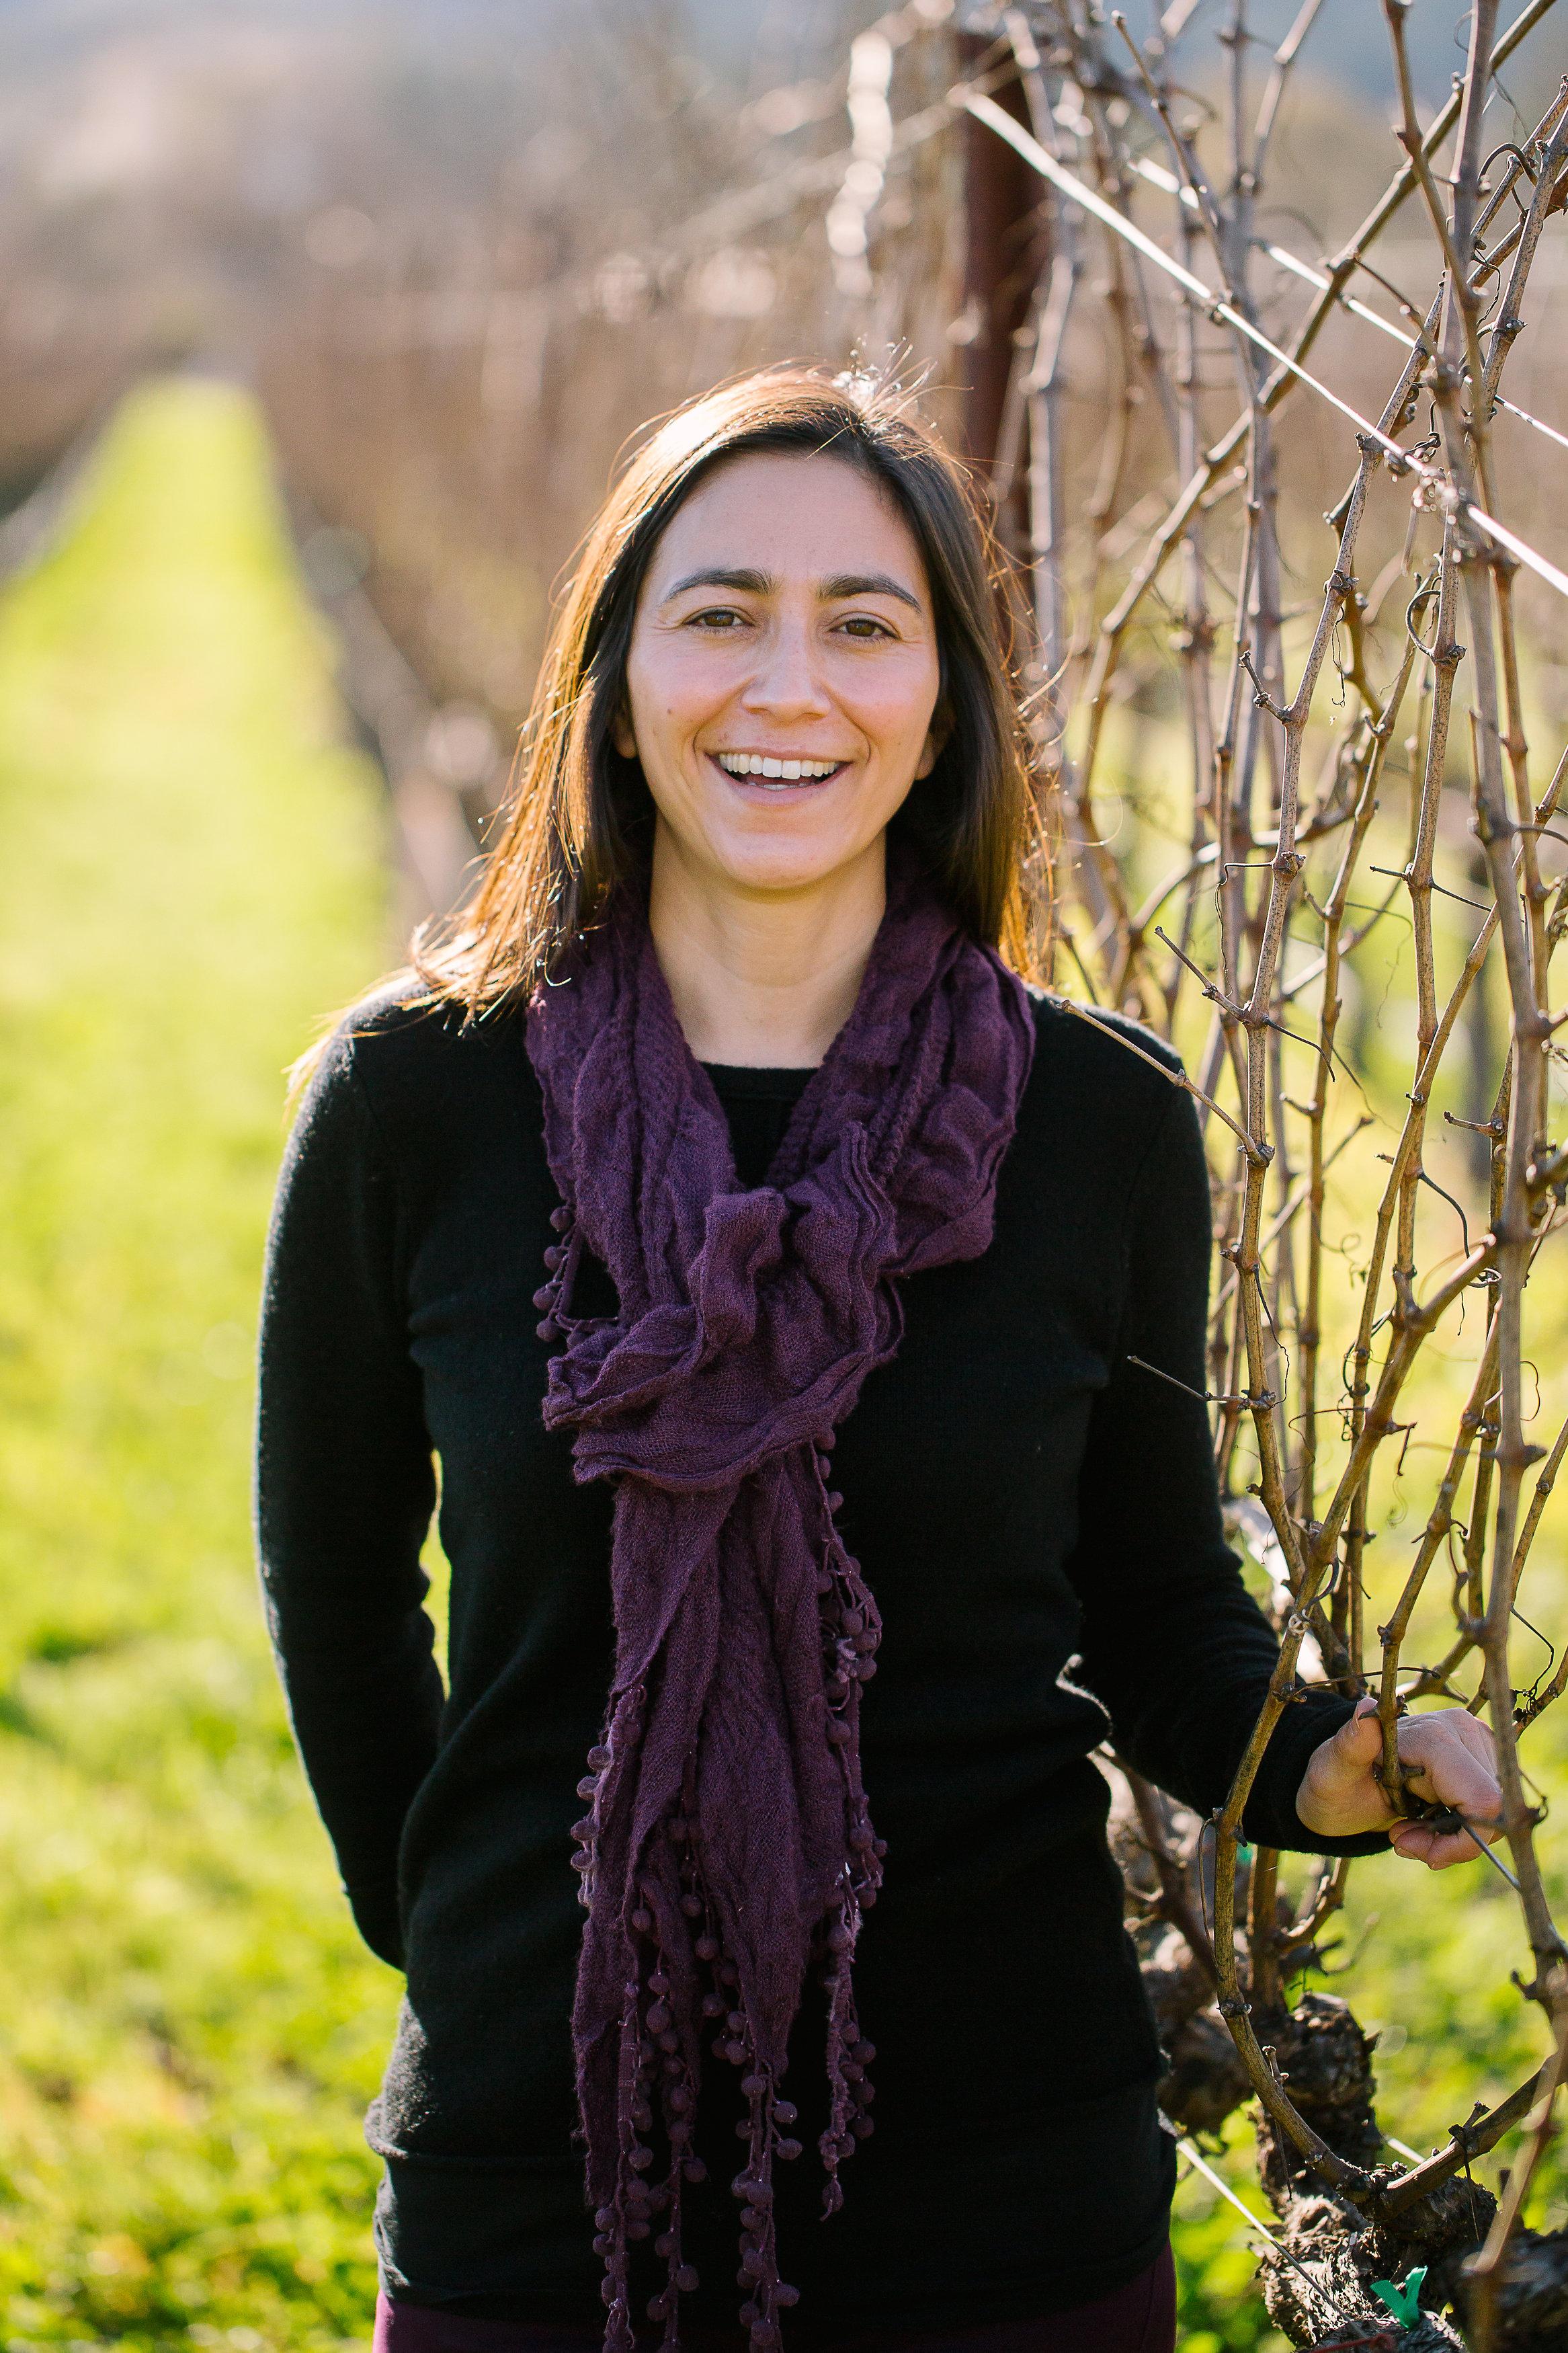 Laura Barrett Winemaker Clif Family Winery.jpg